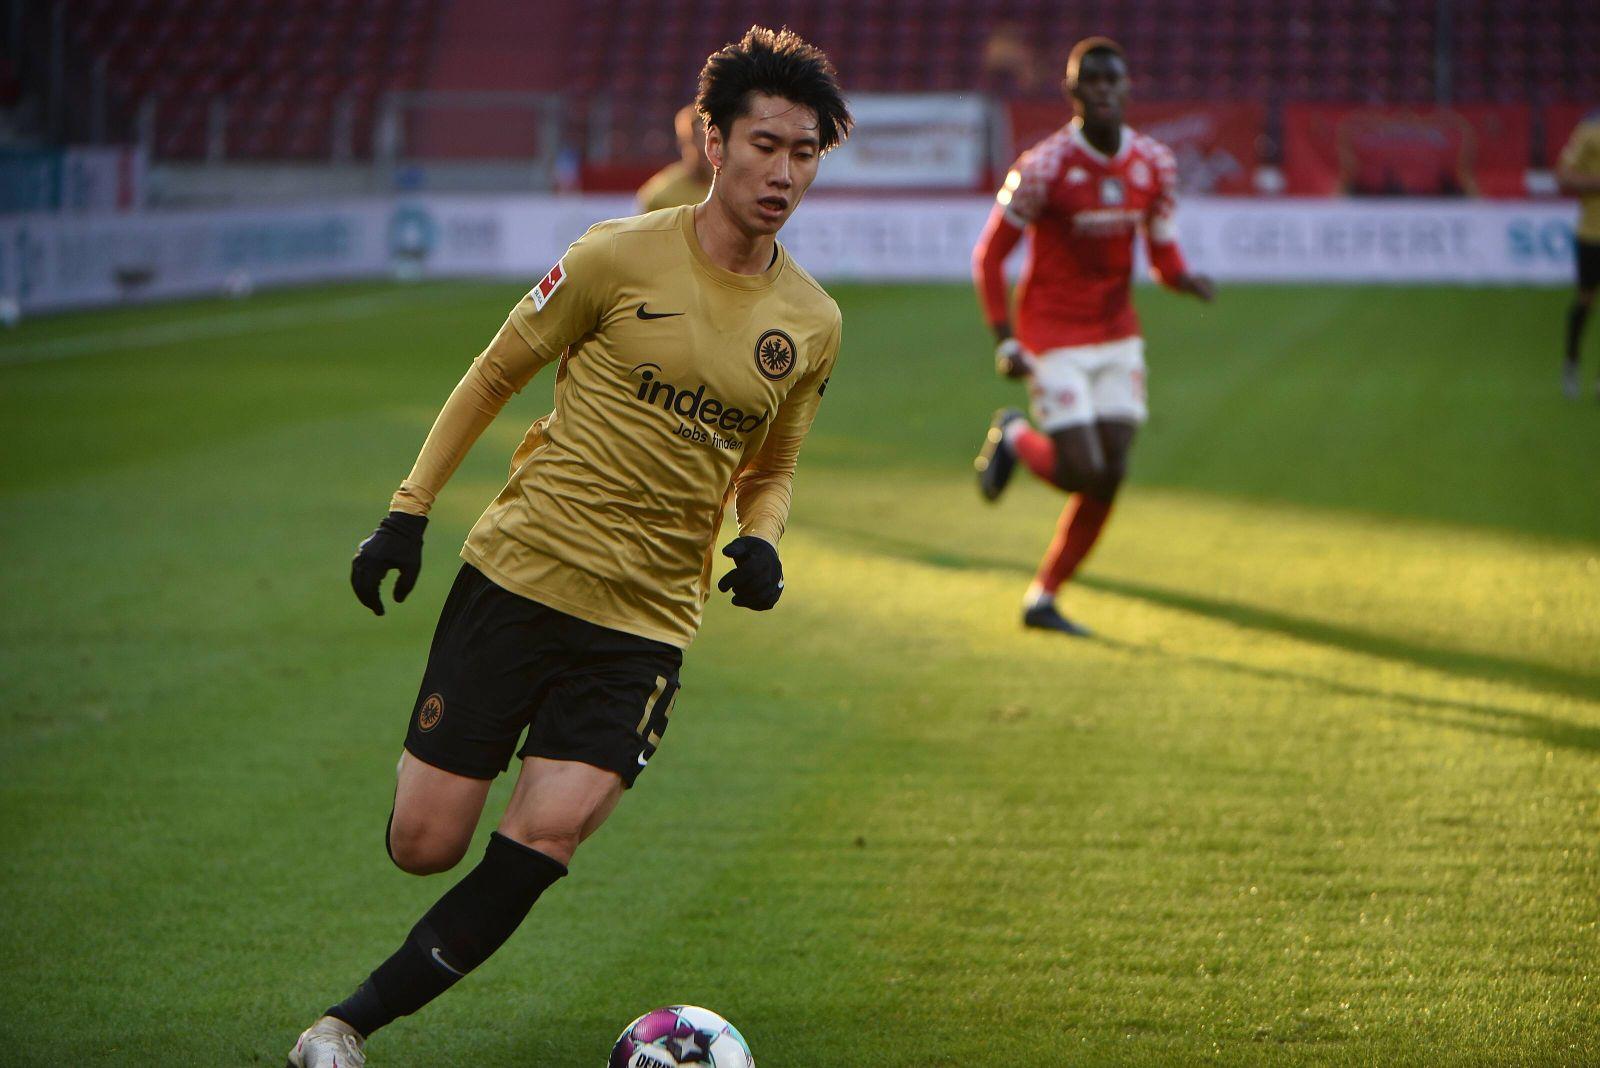 09.01.2021 Mainz, OPEL ARENA Fussball, 1. Bundesliga, Saison 2020/2021 FSV Mainz 05 gegen Eintracht Frankfurt (SGE) Kam